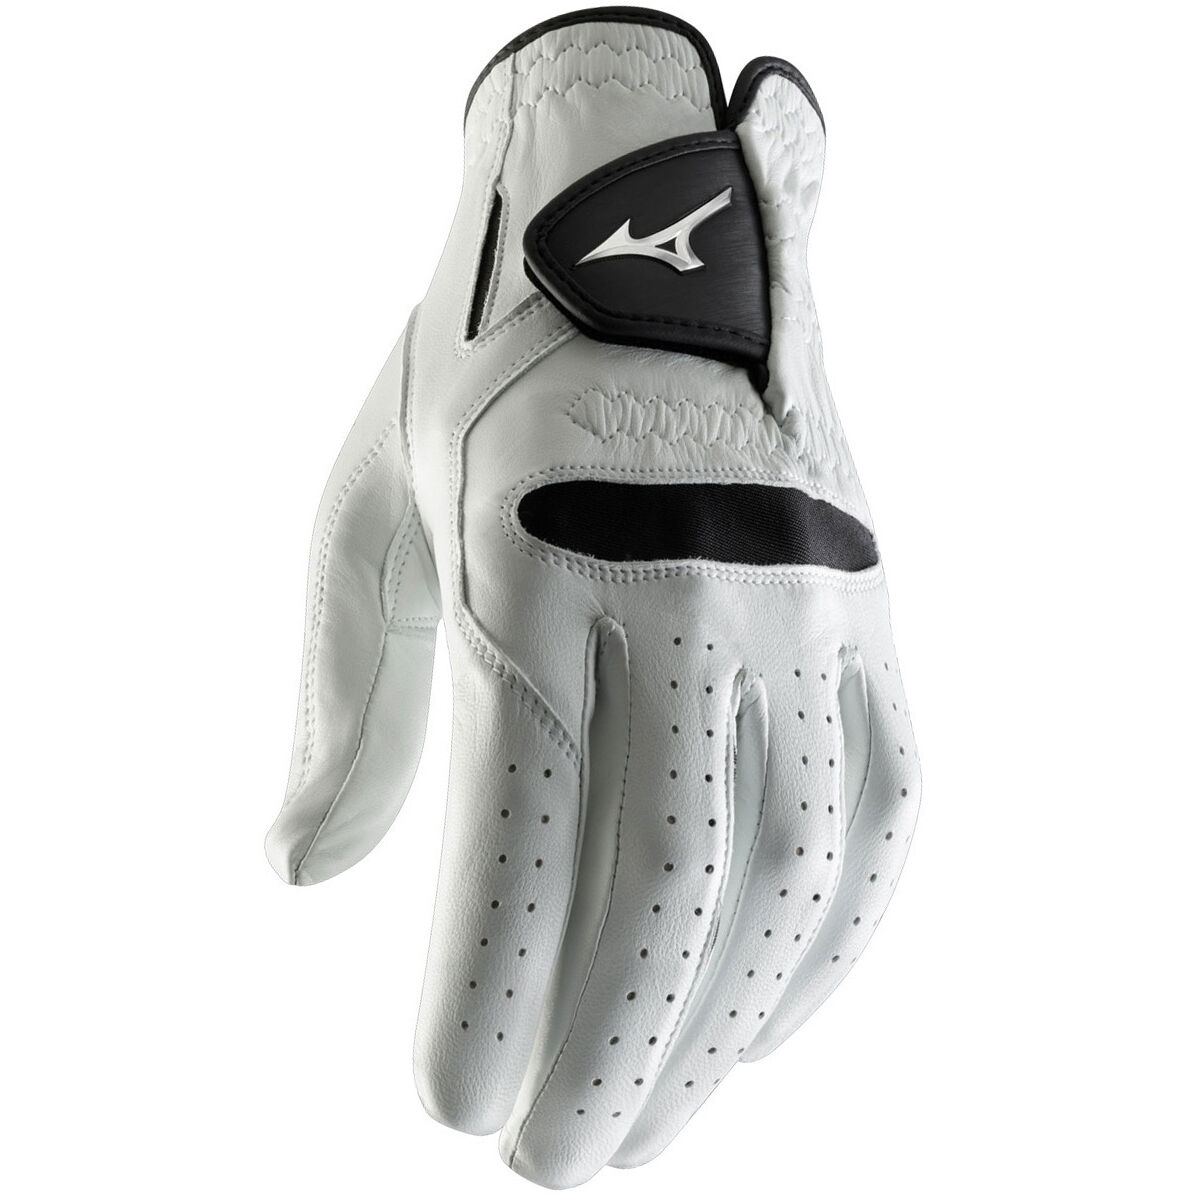 Mizuno Golf Pro Golf Glove, Mens, Right hand, Xl, White   American Golf